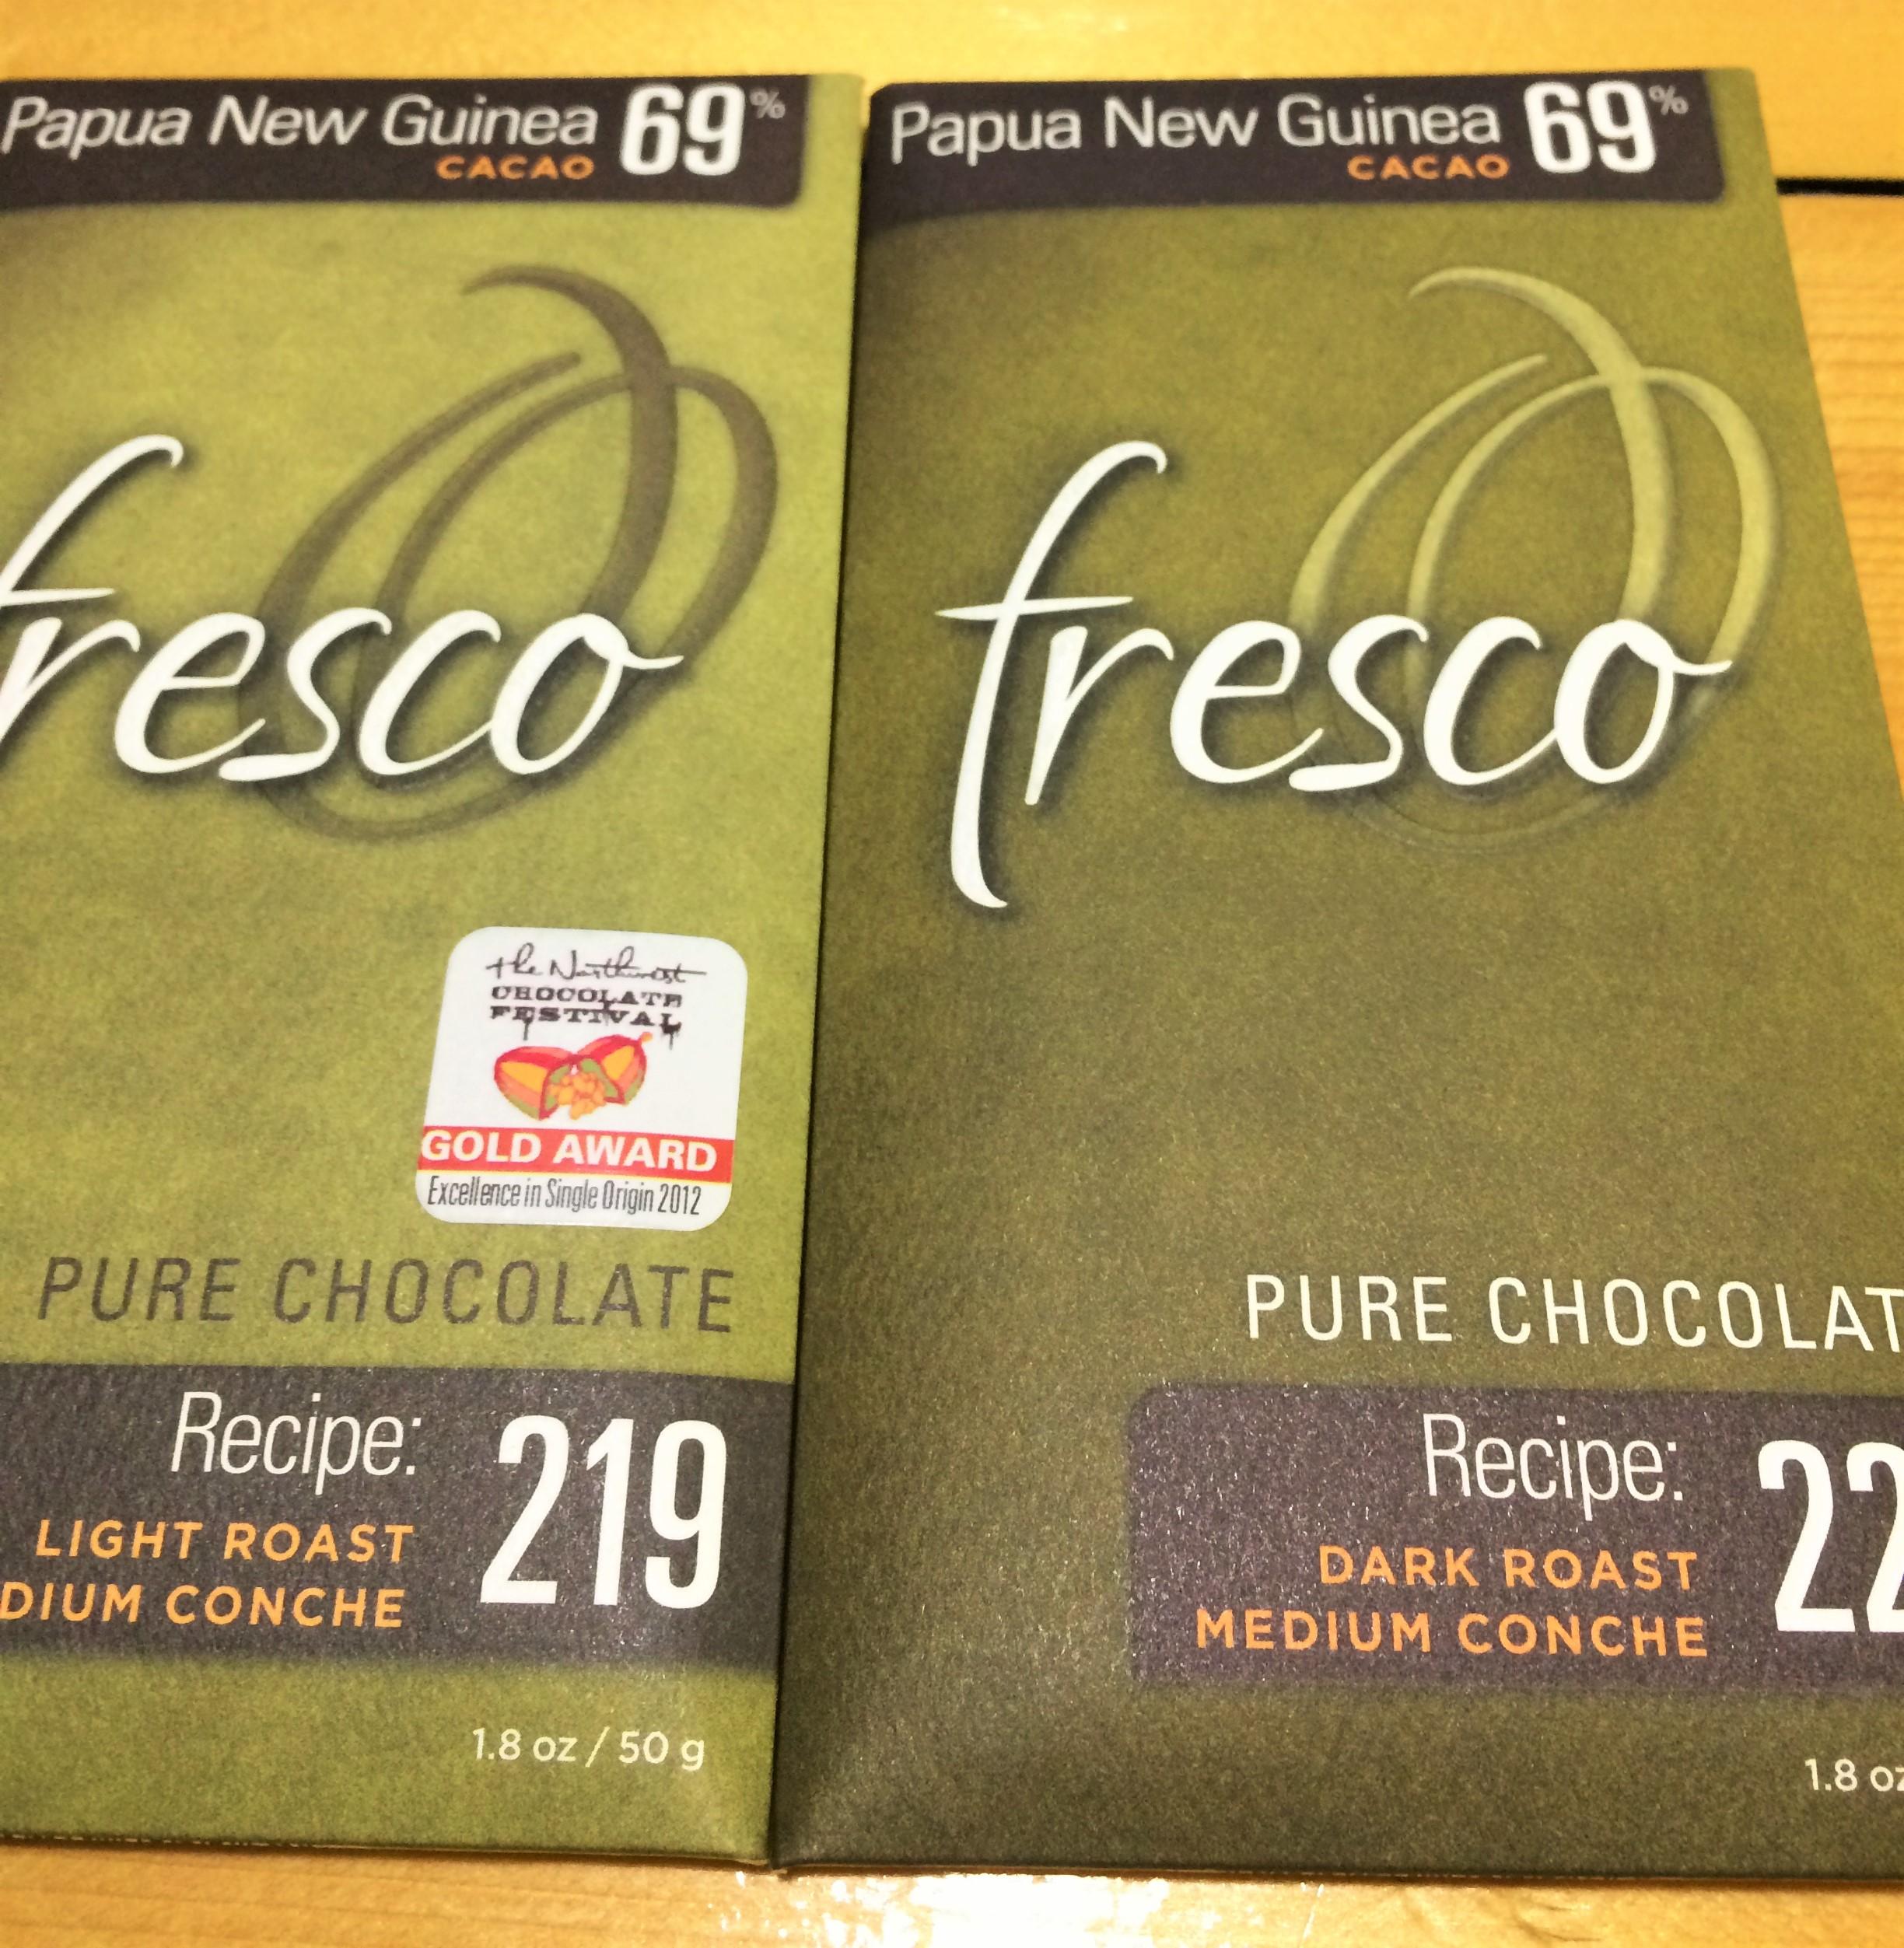 Fresco's PNG bar: light roast vs dark roast, both with a medium conche.